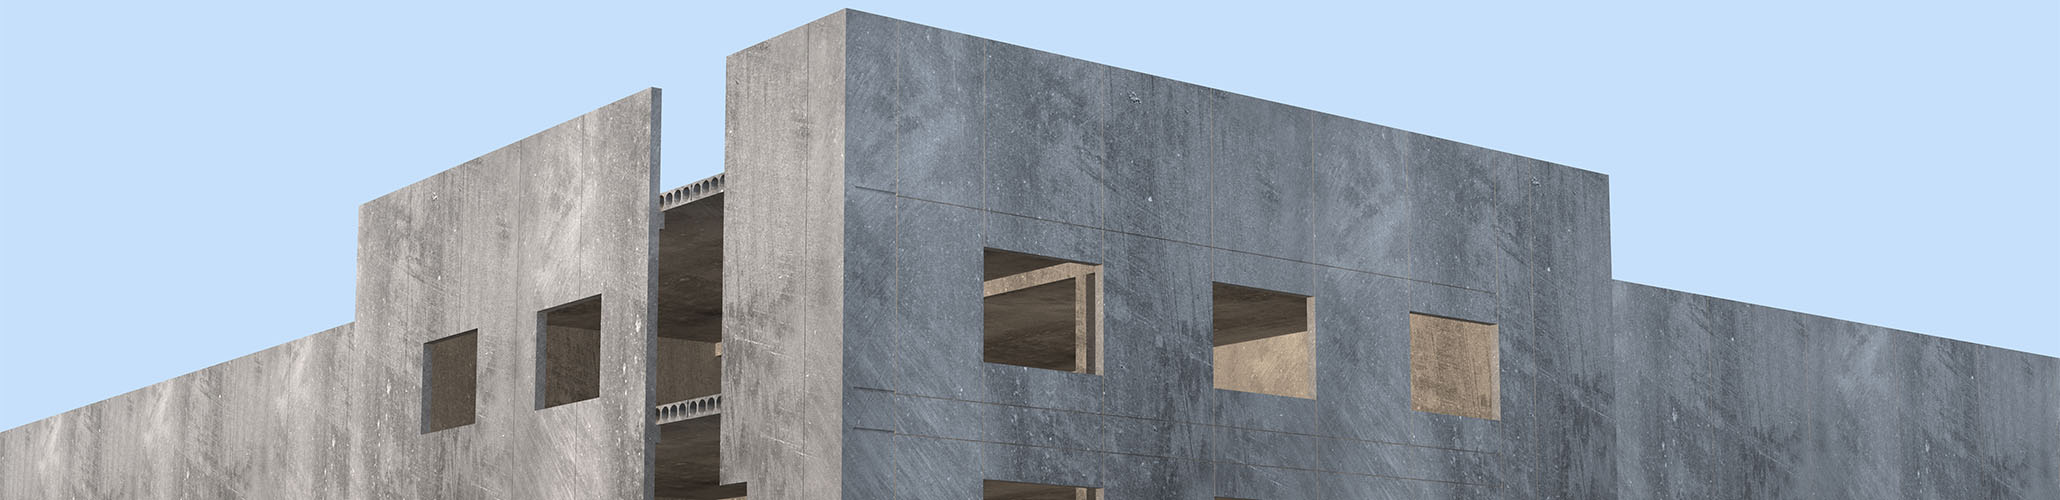 rendering precast building-1